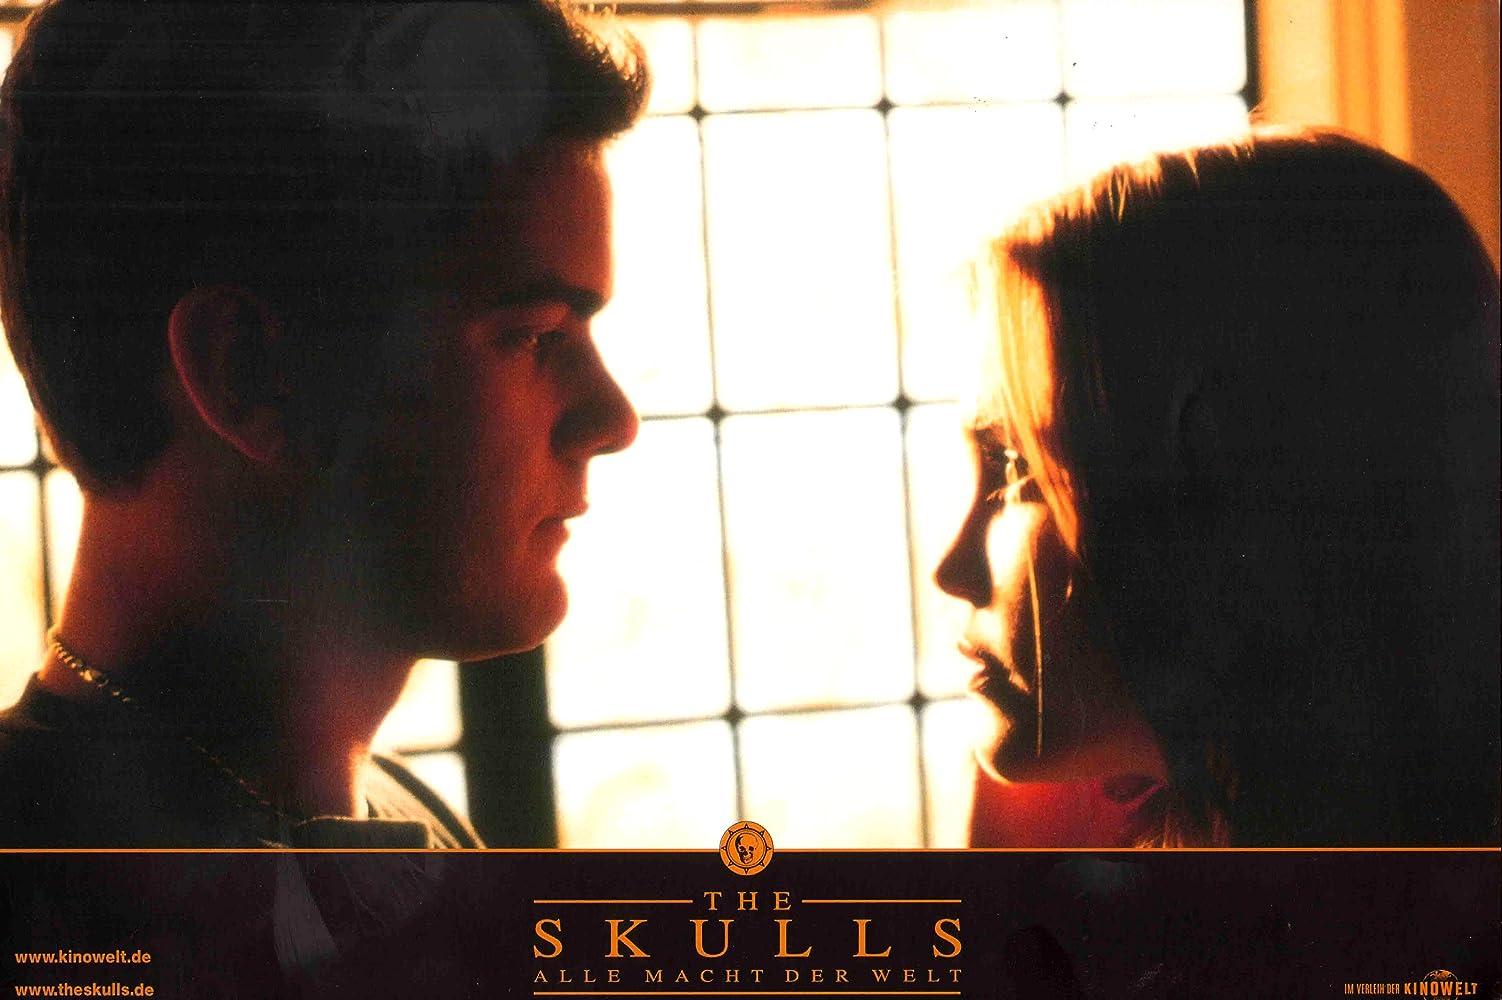 the skulls full movie 2000